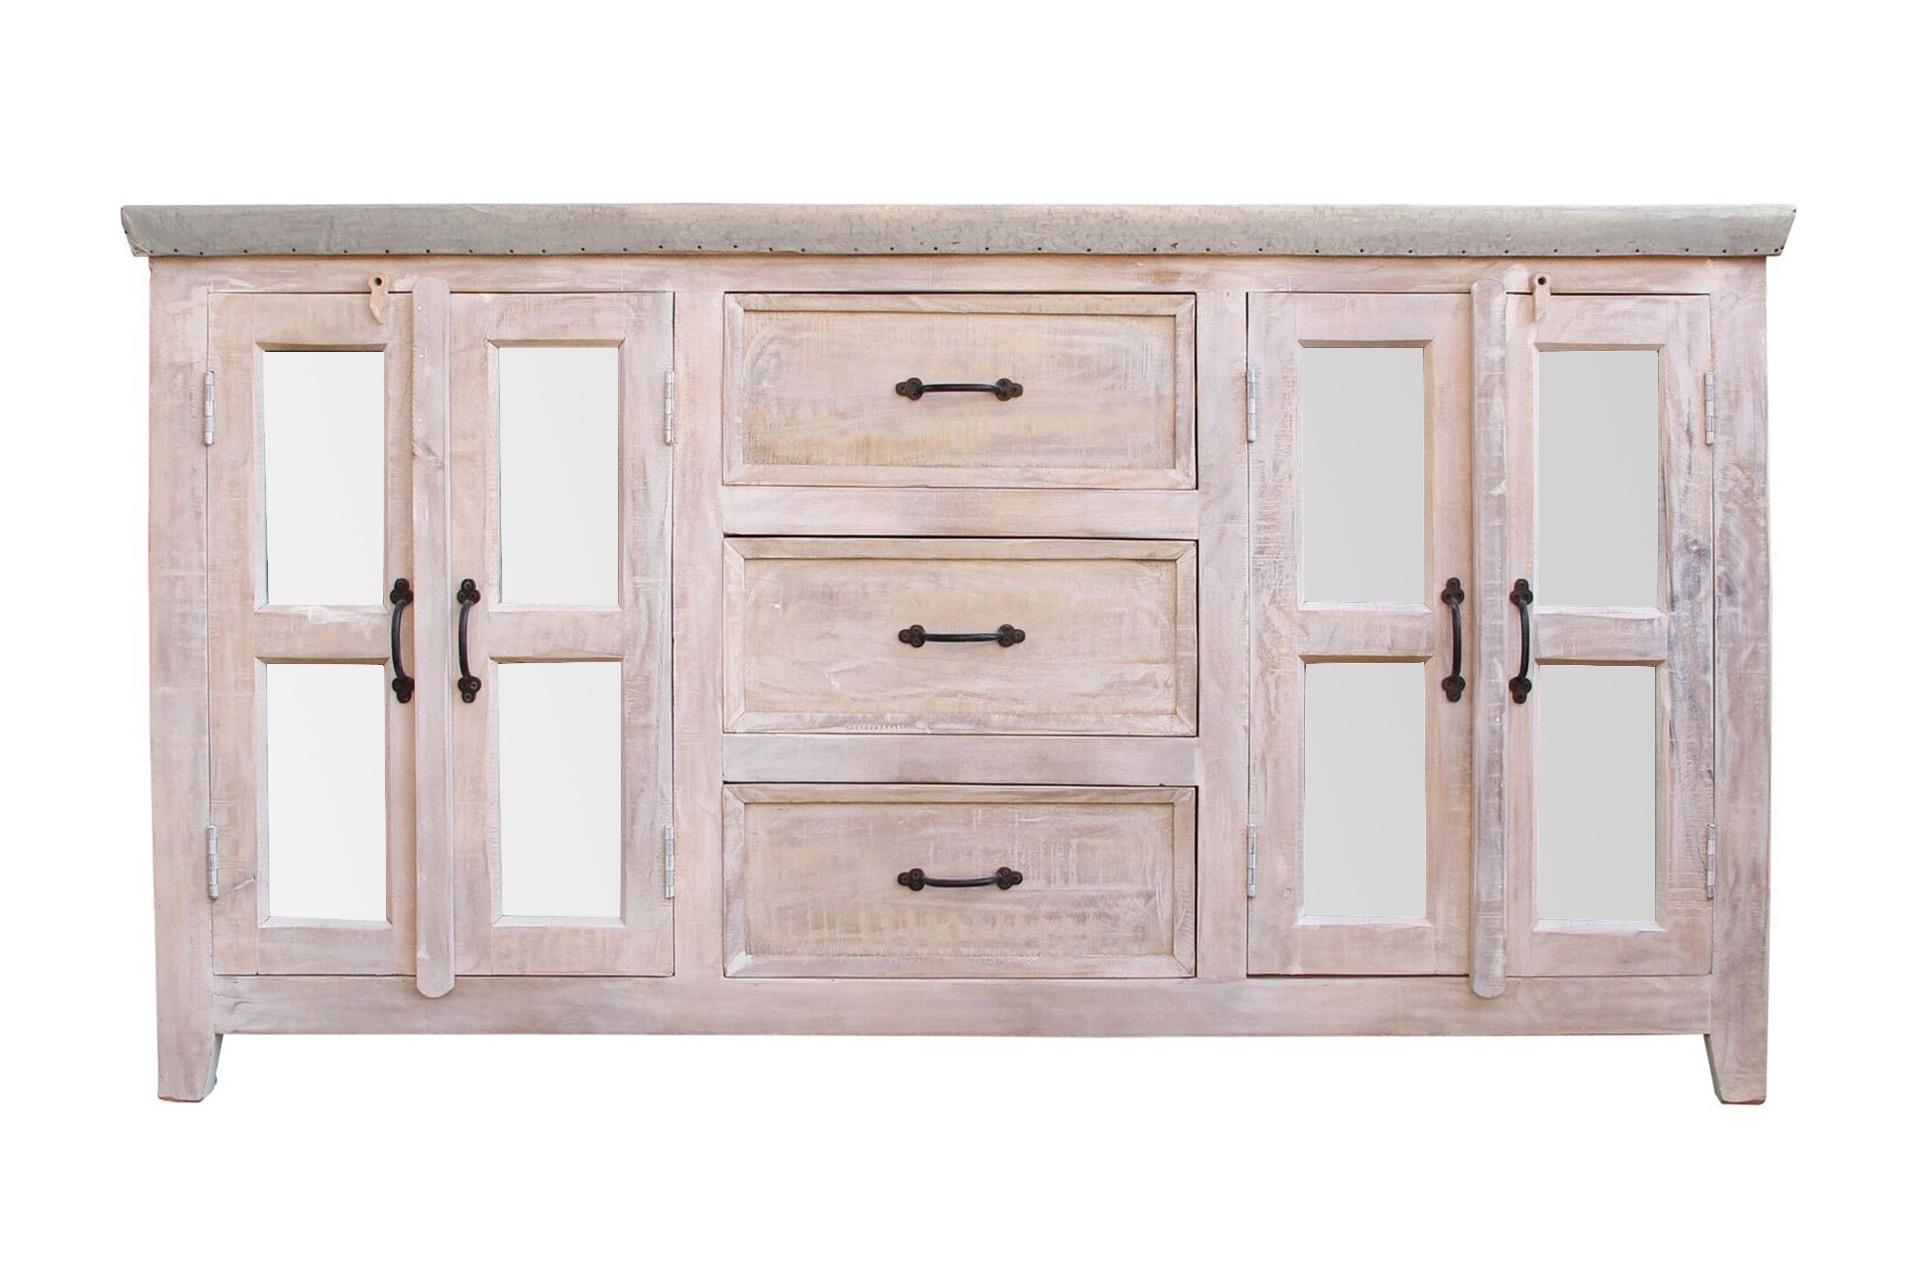 White Wash 4 Door/3 Drawer Glass Sideboard Intended For White Wash 3 Door 3 Drawer Sideboards (Photo 3 of 30)